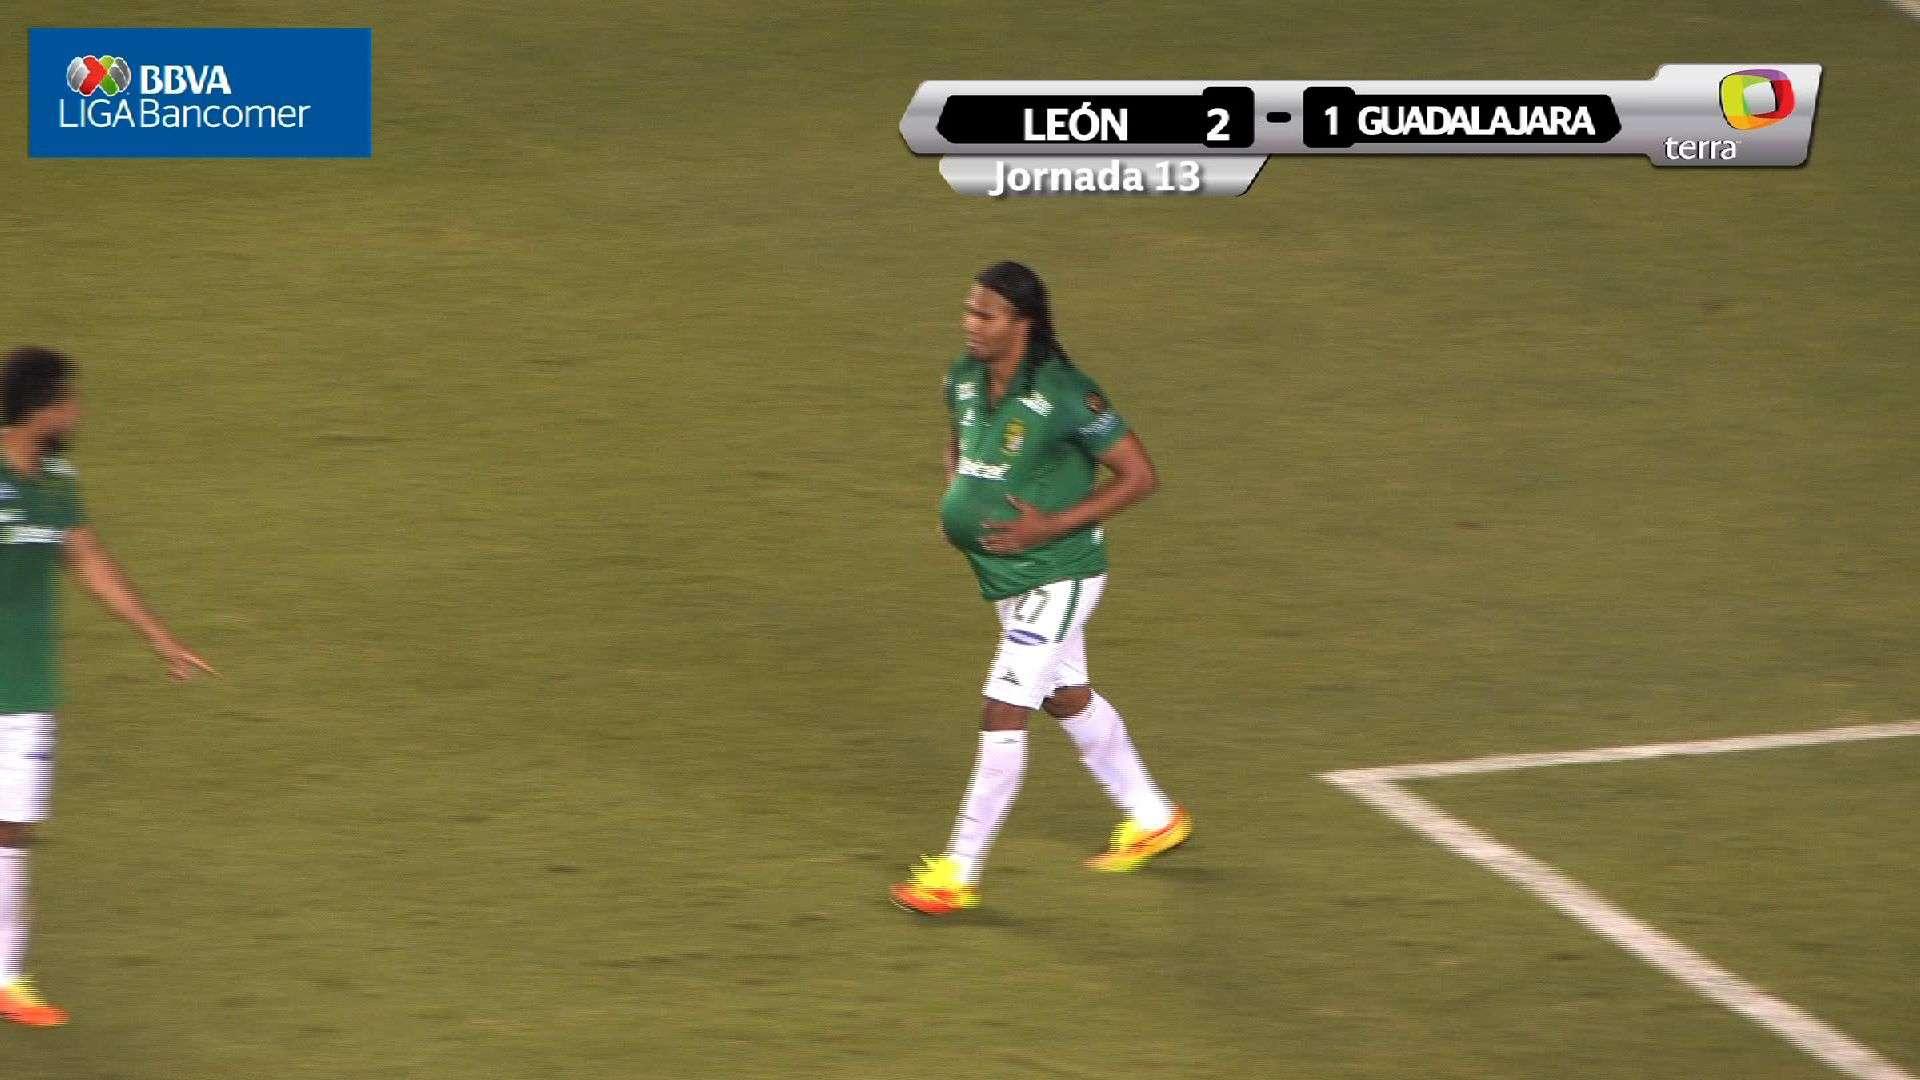 Jornada 13, León 2-1 Guadalajara, Apertura 2014